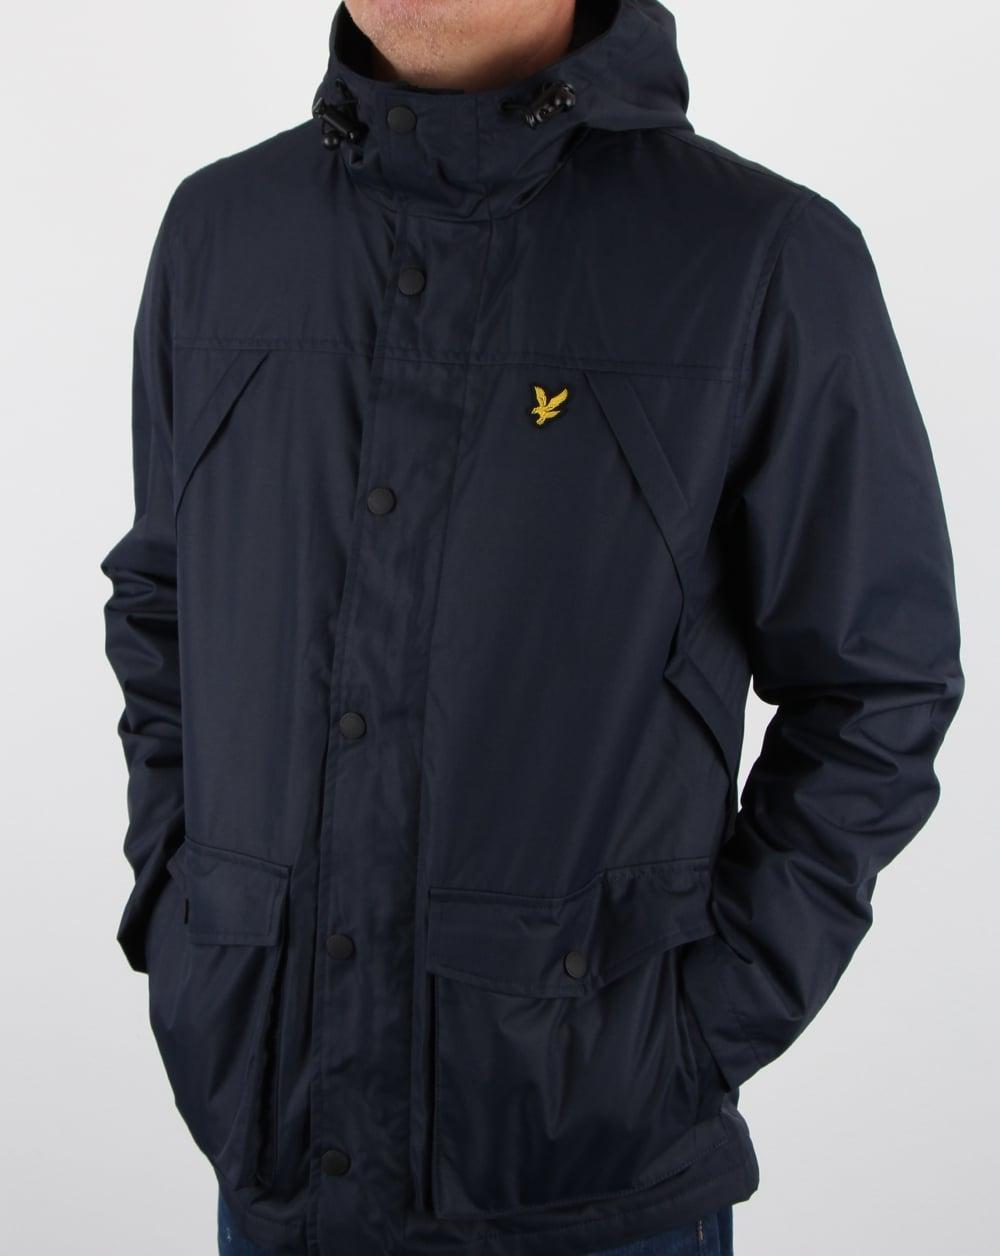 lyle and scott micro fleece lined jacket navy men 39 s coat. Black Bedroom Furniture Sets. Home Design Ideas